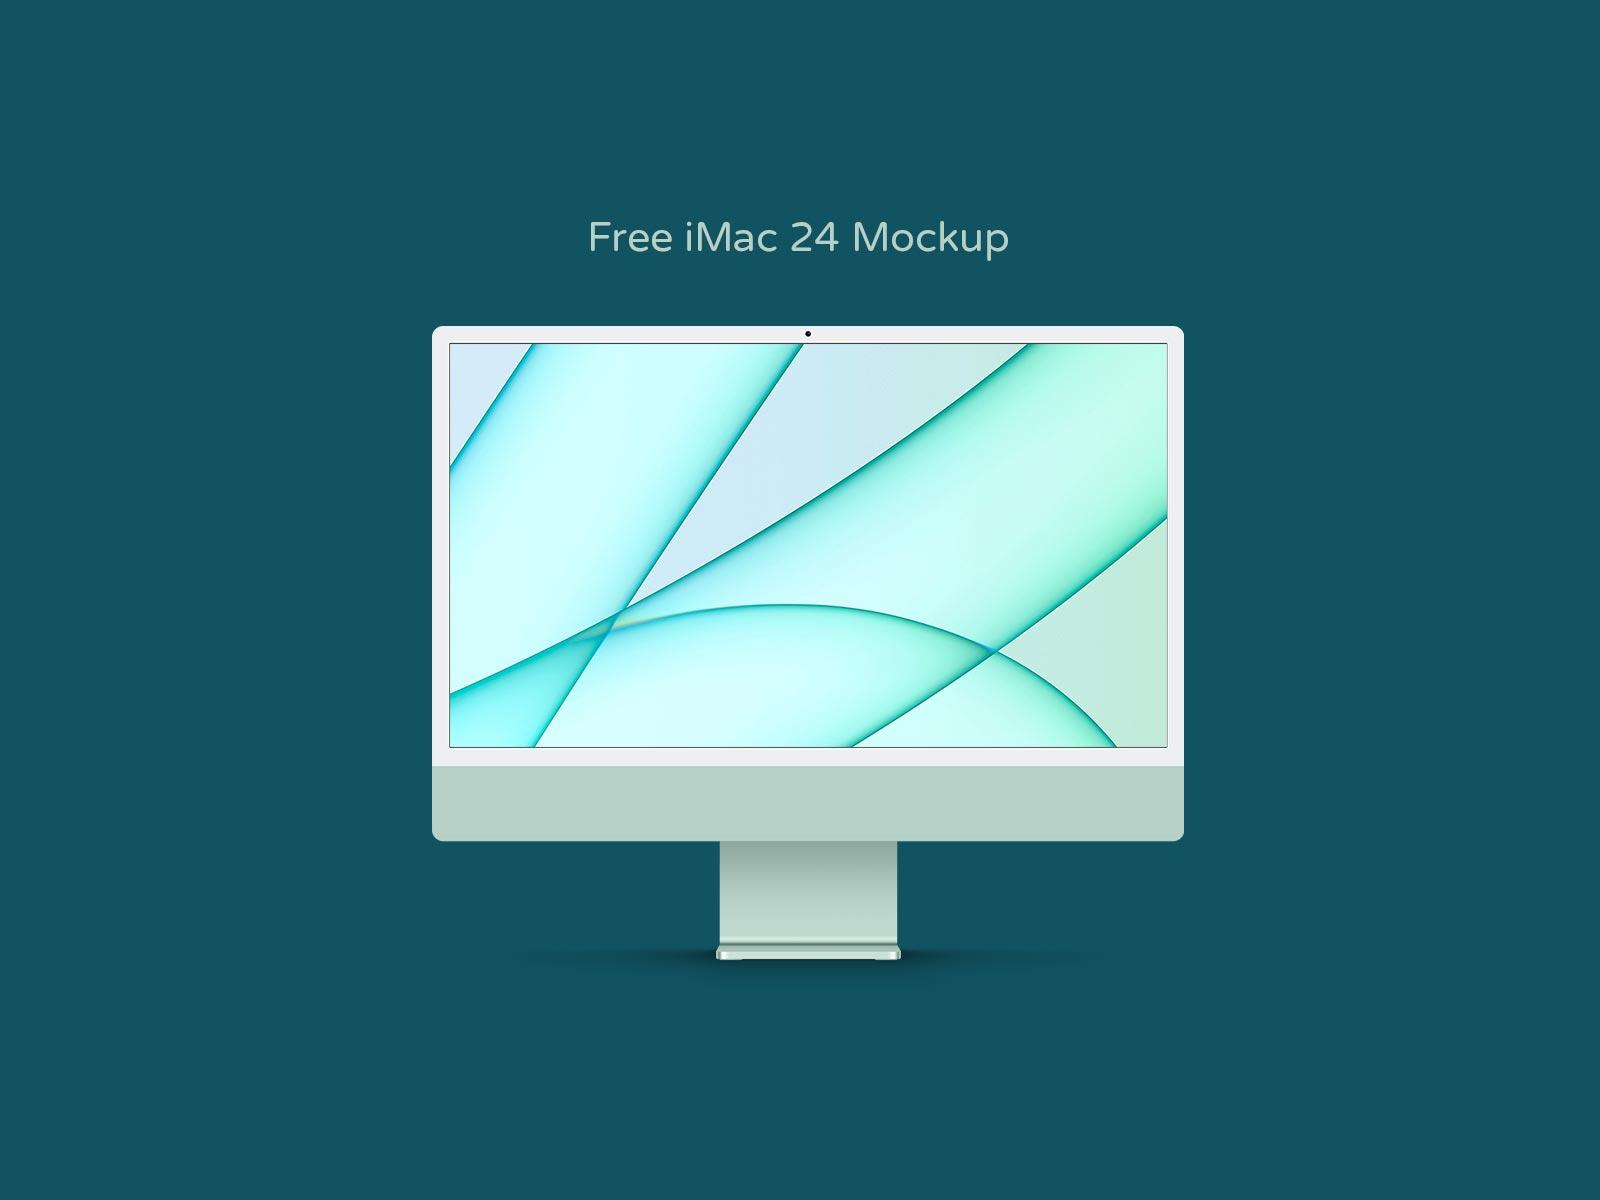 Green-iMac-24-Mockup-PSD